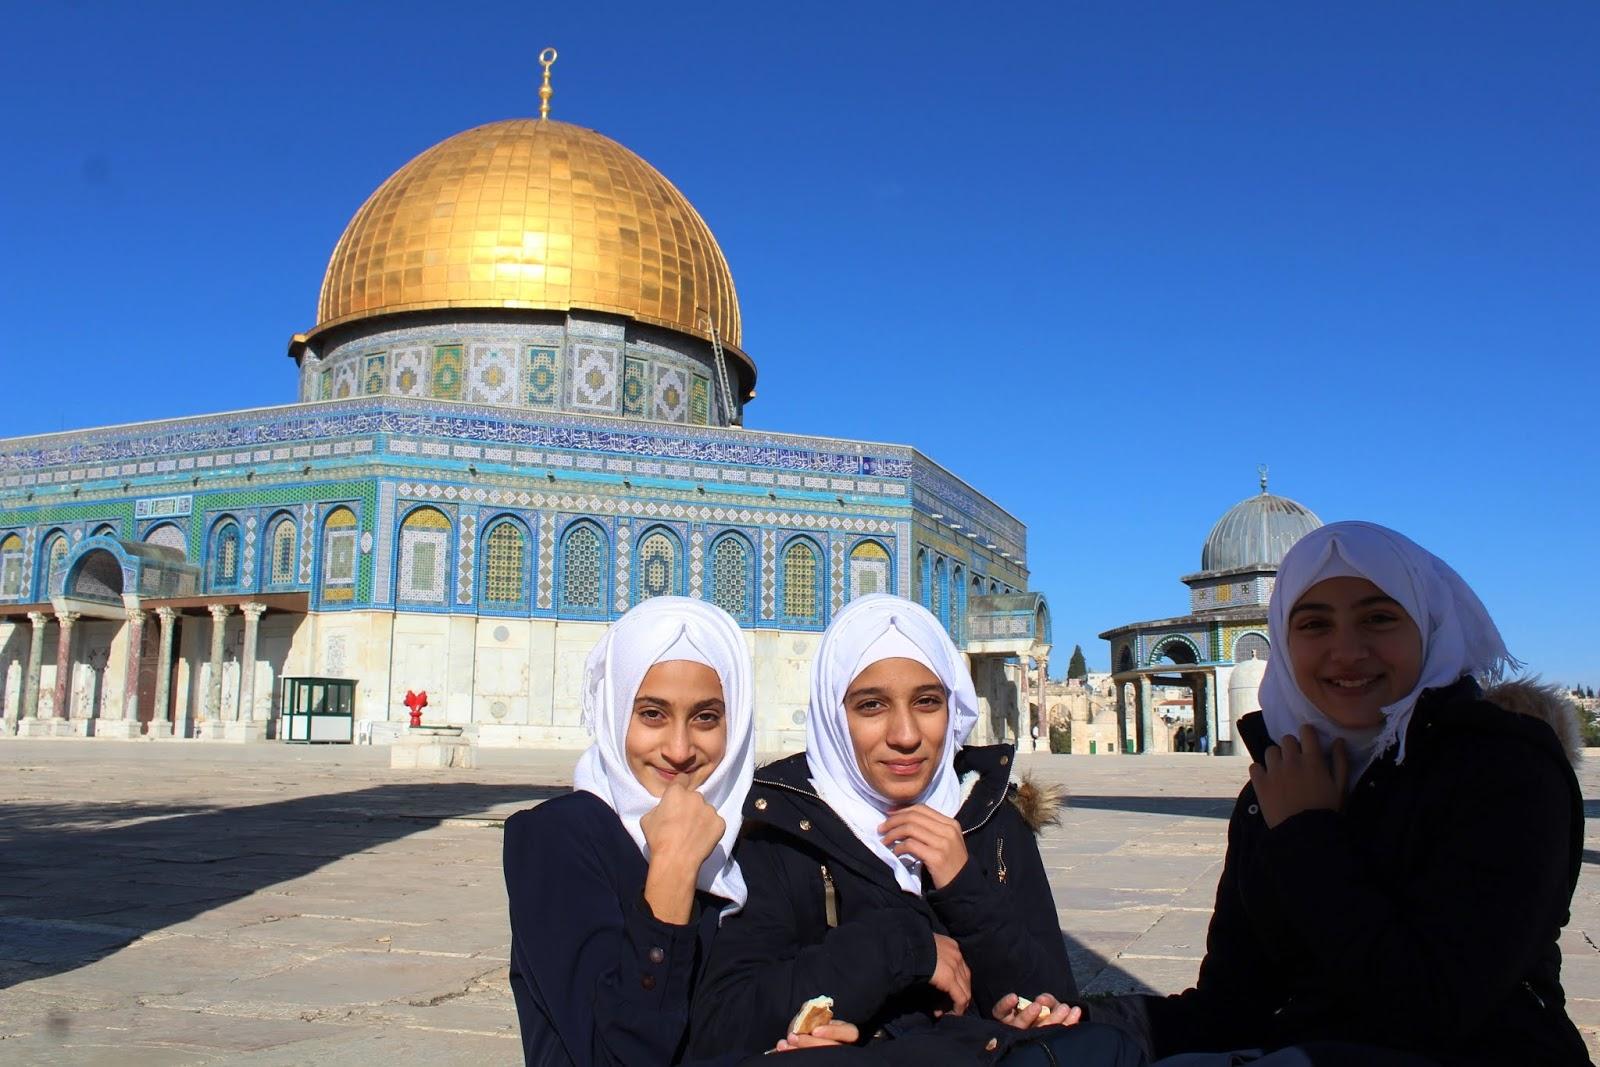 spianata delle mosche gerusalemme israele